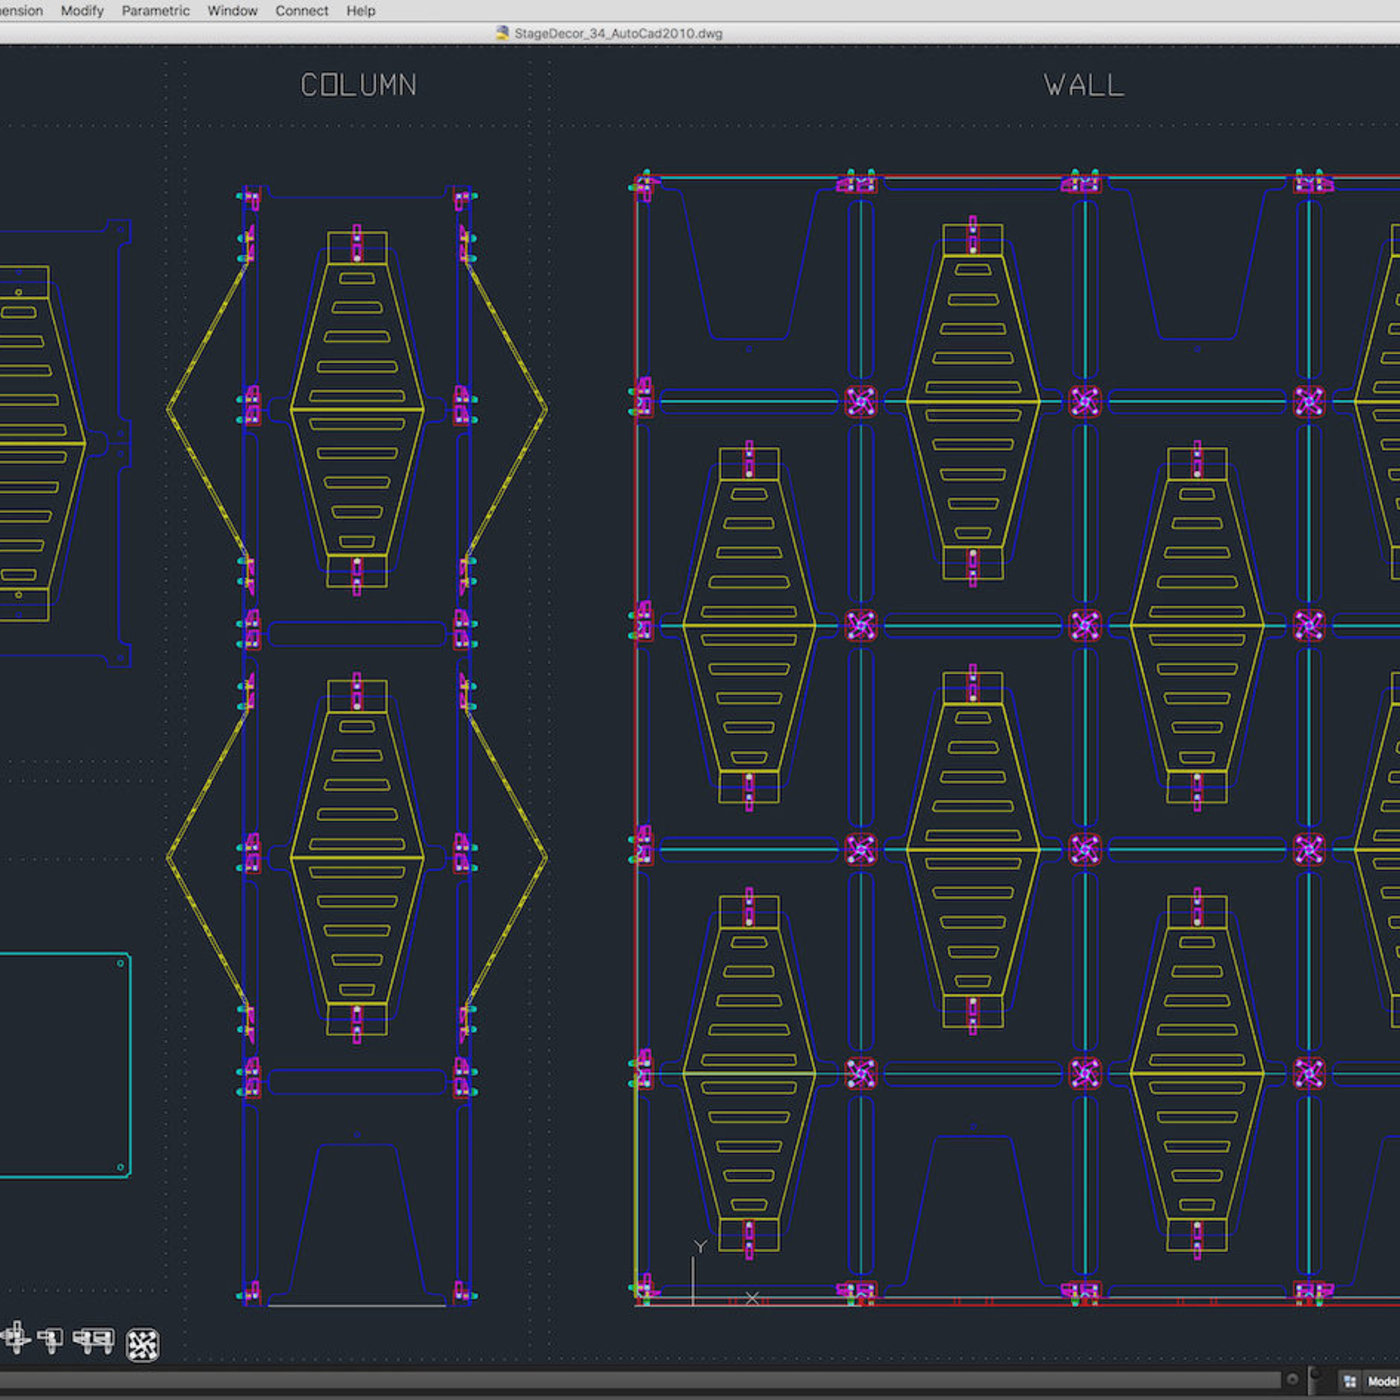 Stage Decor 34 Modular Wall Column